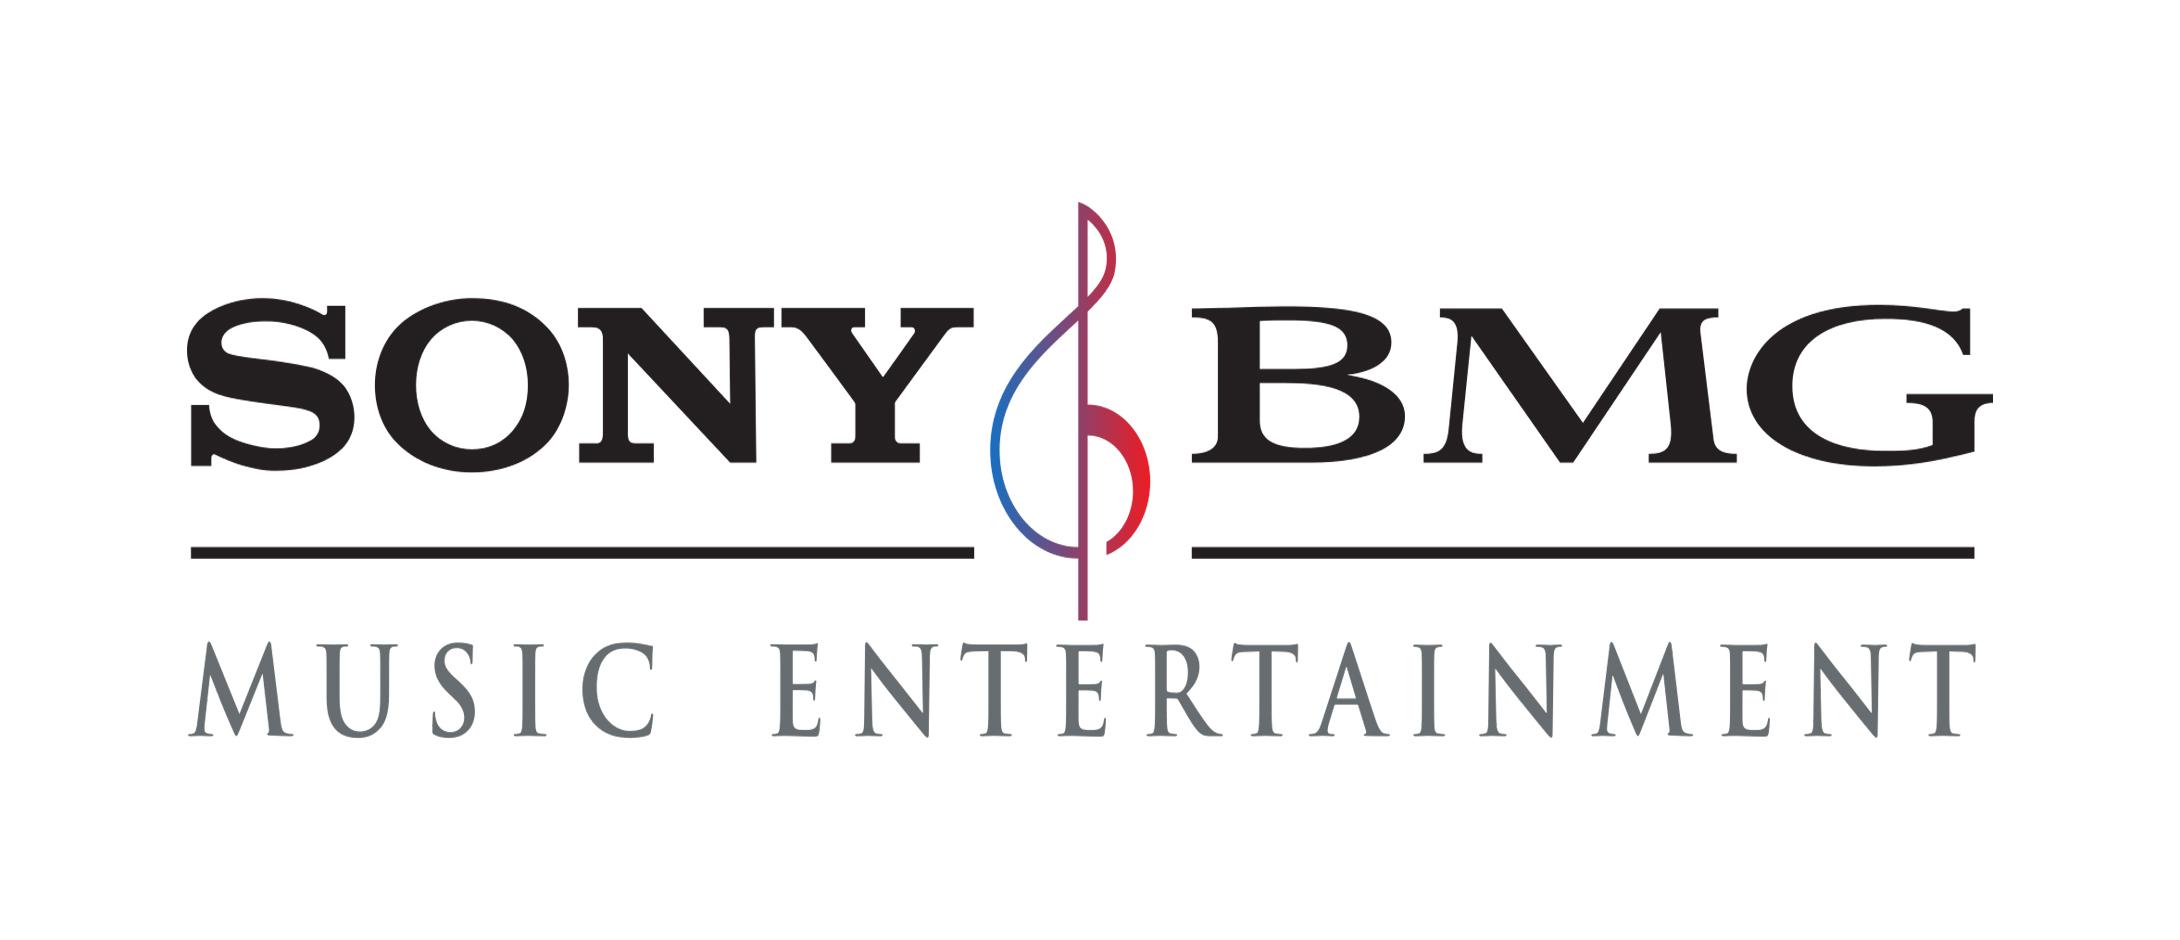 Sonybmg-logo.jpg